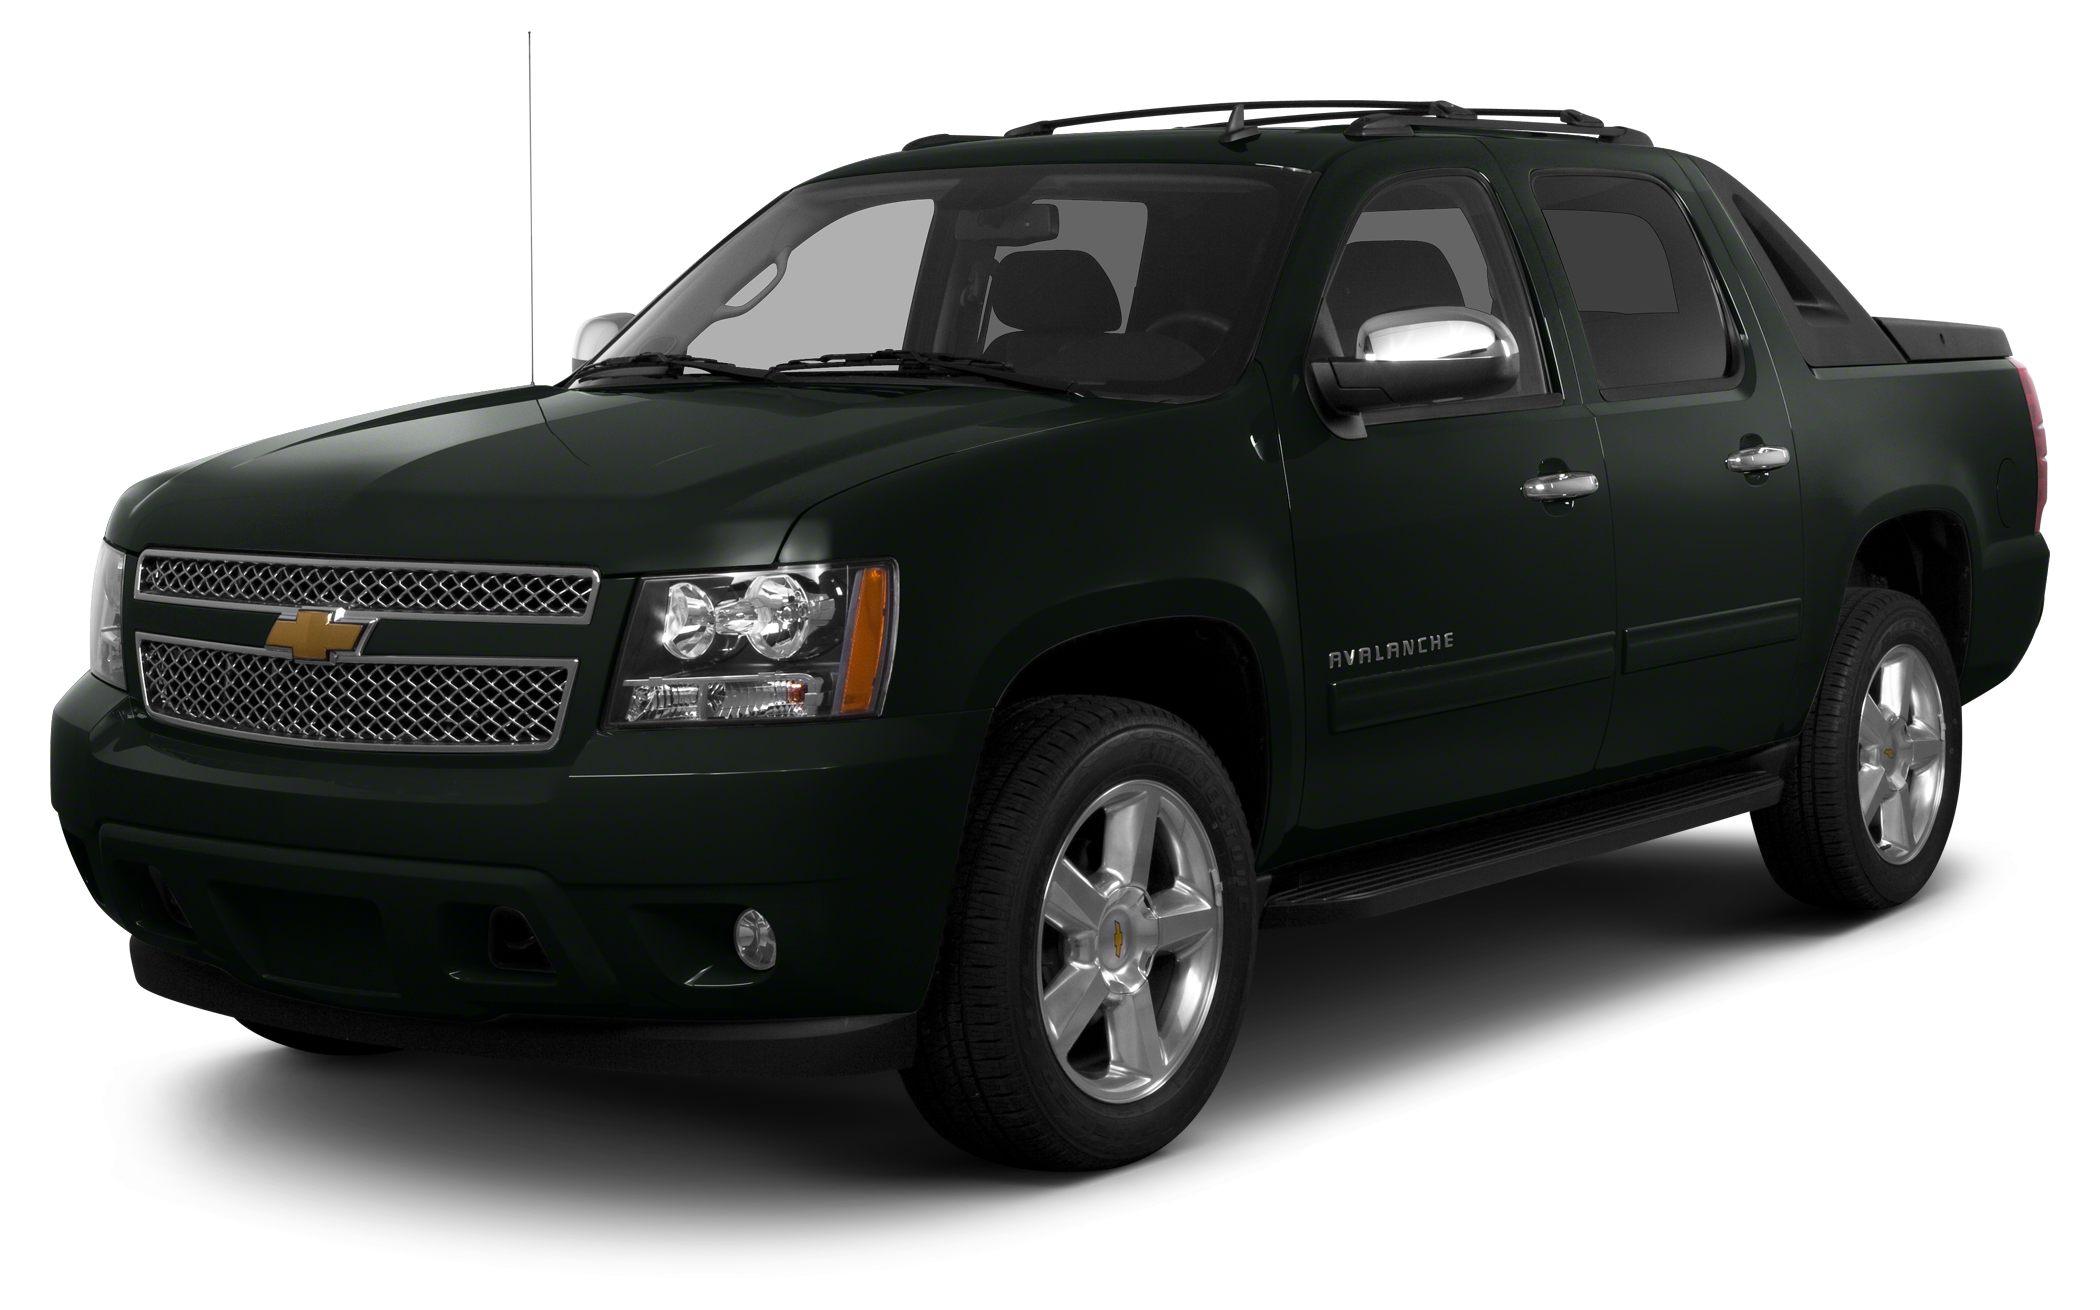 2013 Chevrolet Avalanche LS Miles 36728Color Green Stock 165108 VIN 3GNMCEE03DG256138